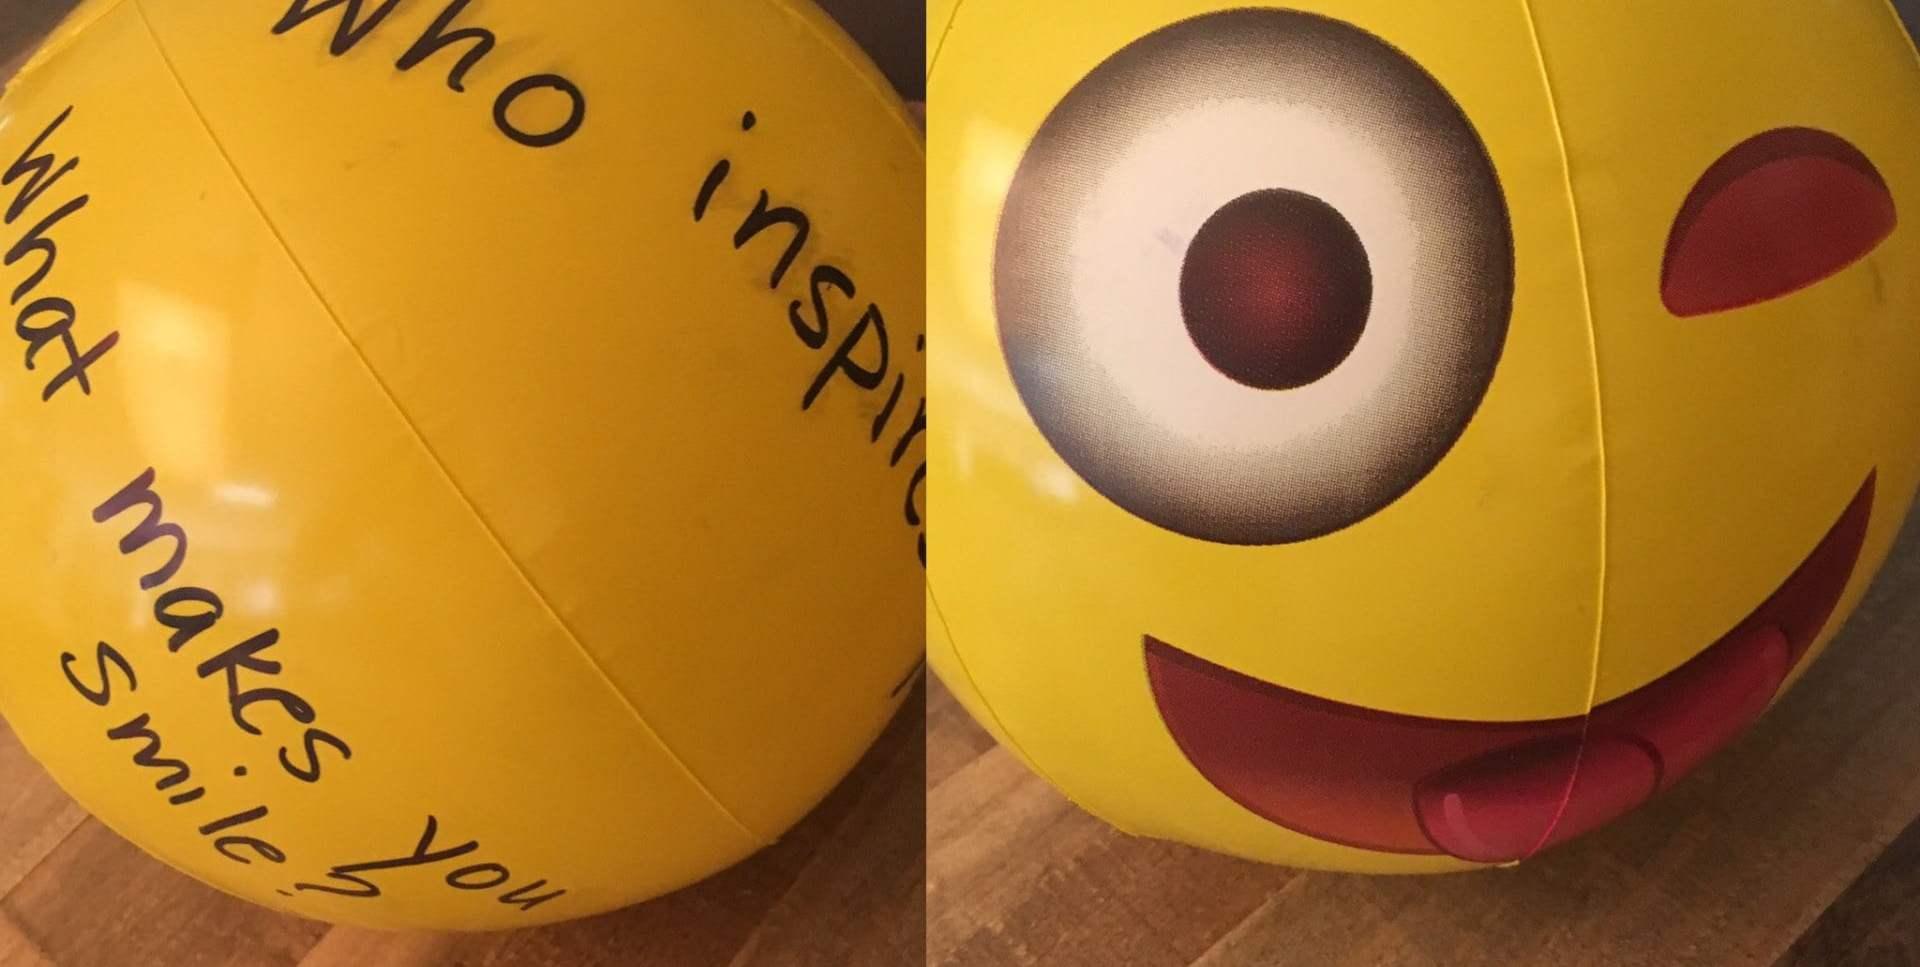 Toss the Gratitude Emoji Ball